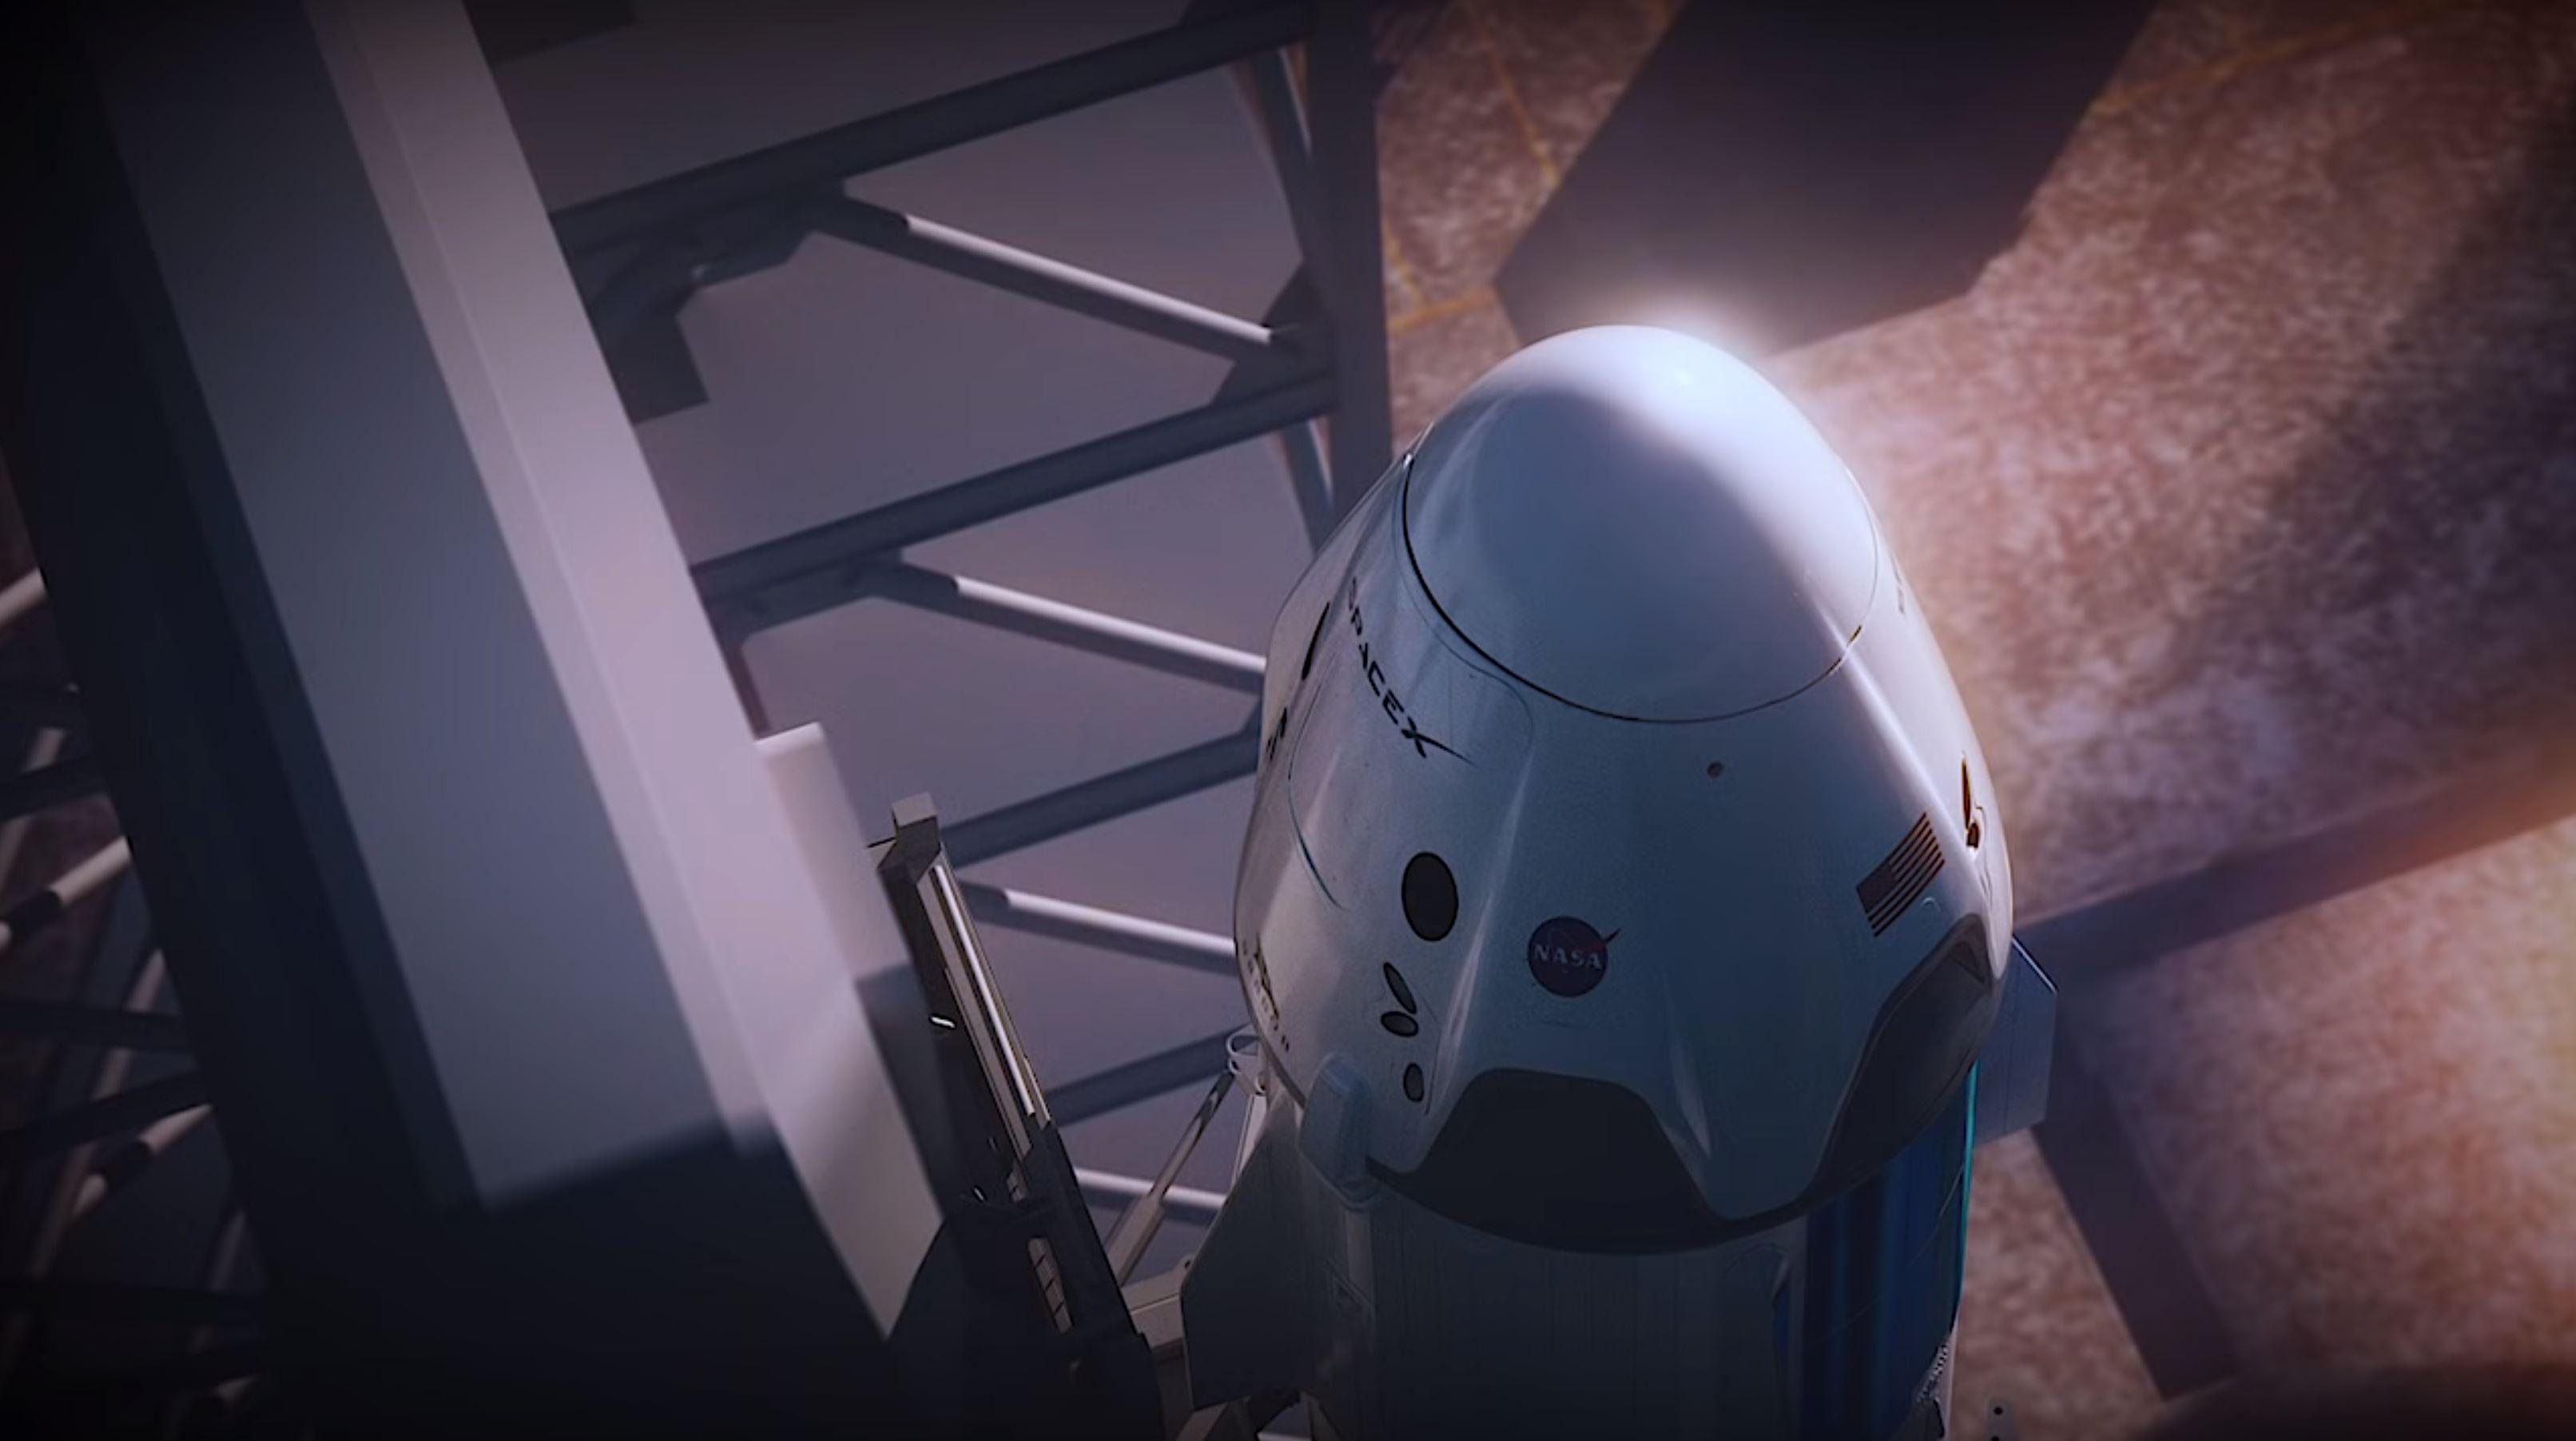 Crew Dragon atop Falcon 9 at 39A (SpaceX)